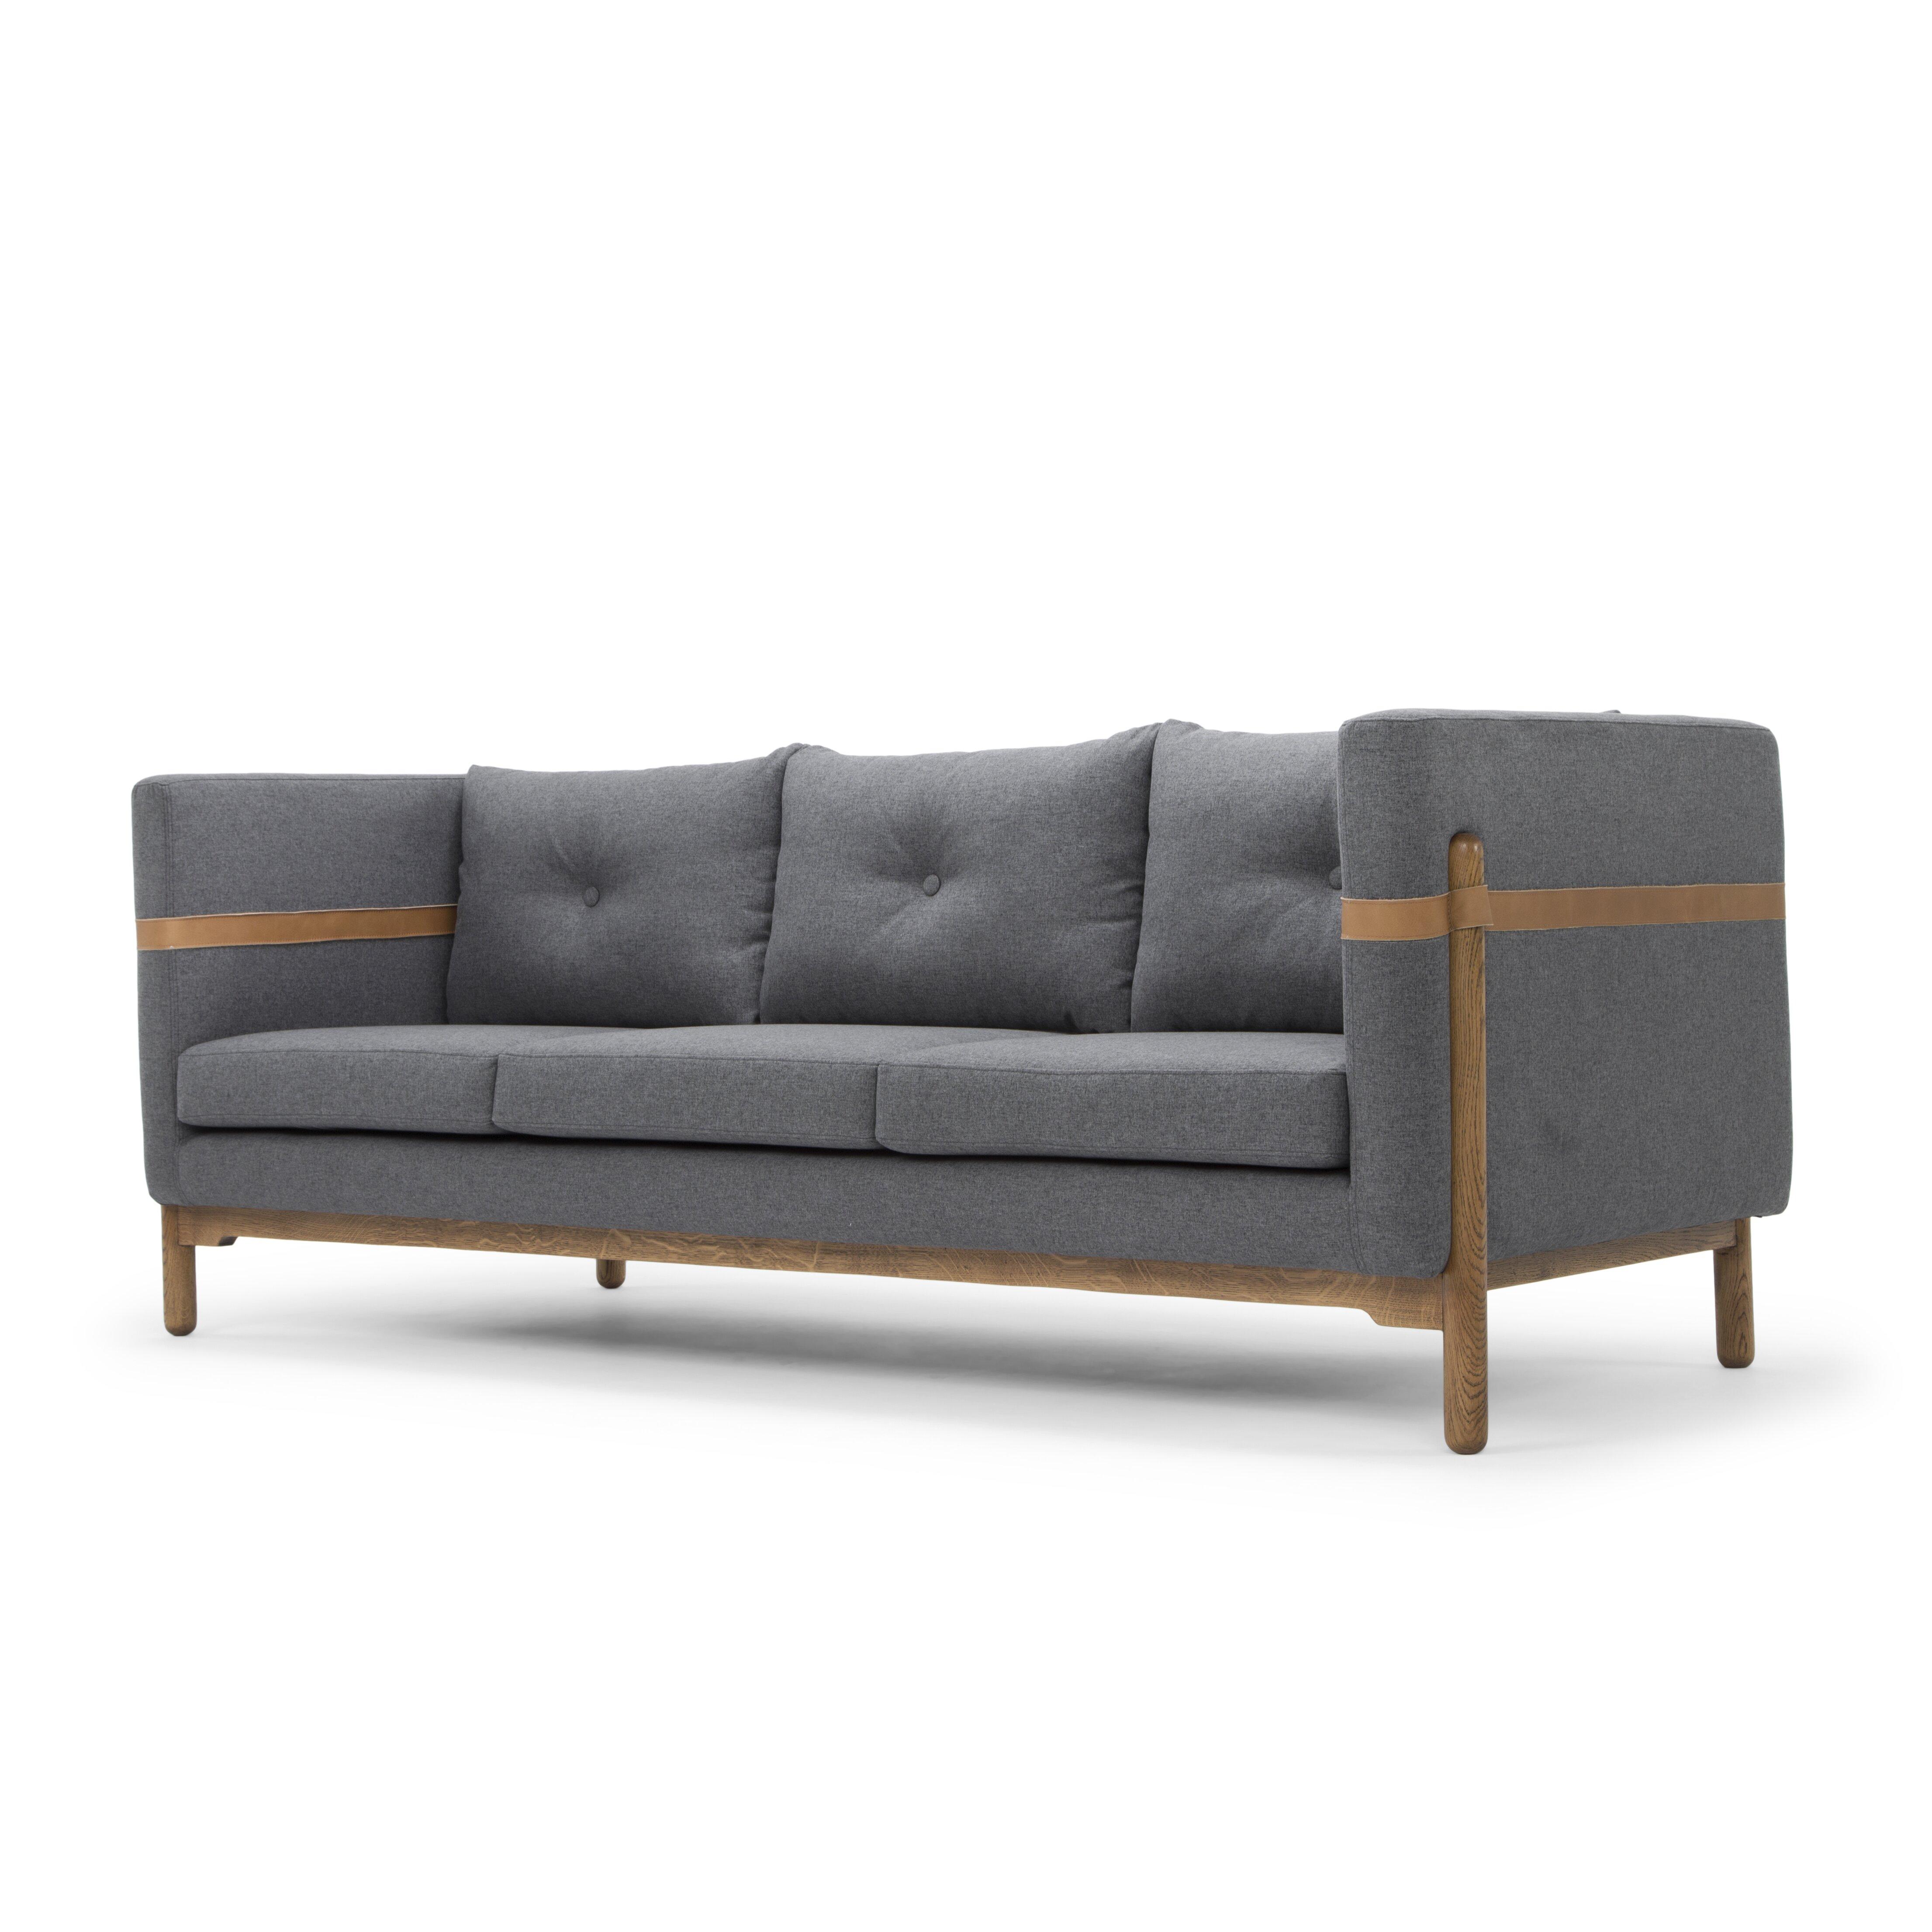 Nordic upholstery solveig classic modern sofa wayfair for Sofa nordic